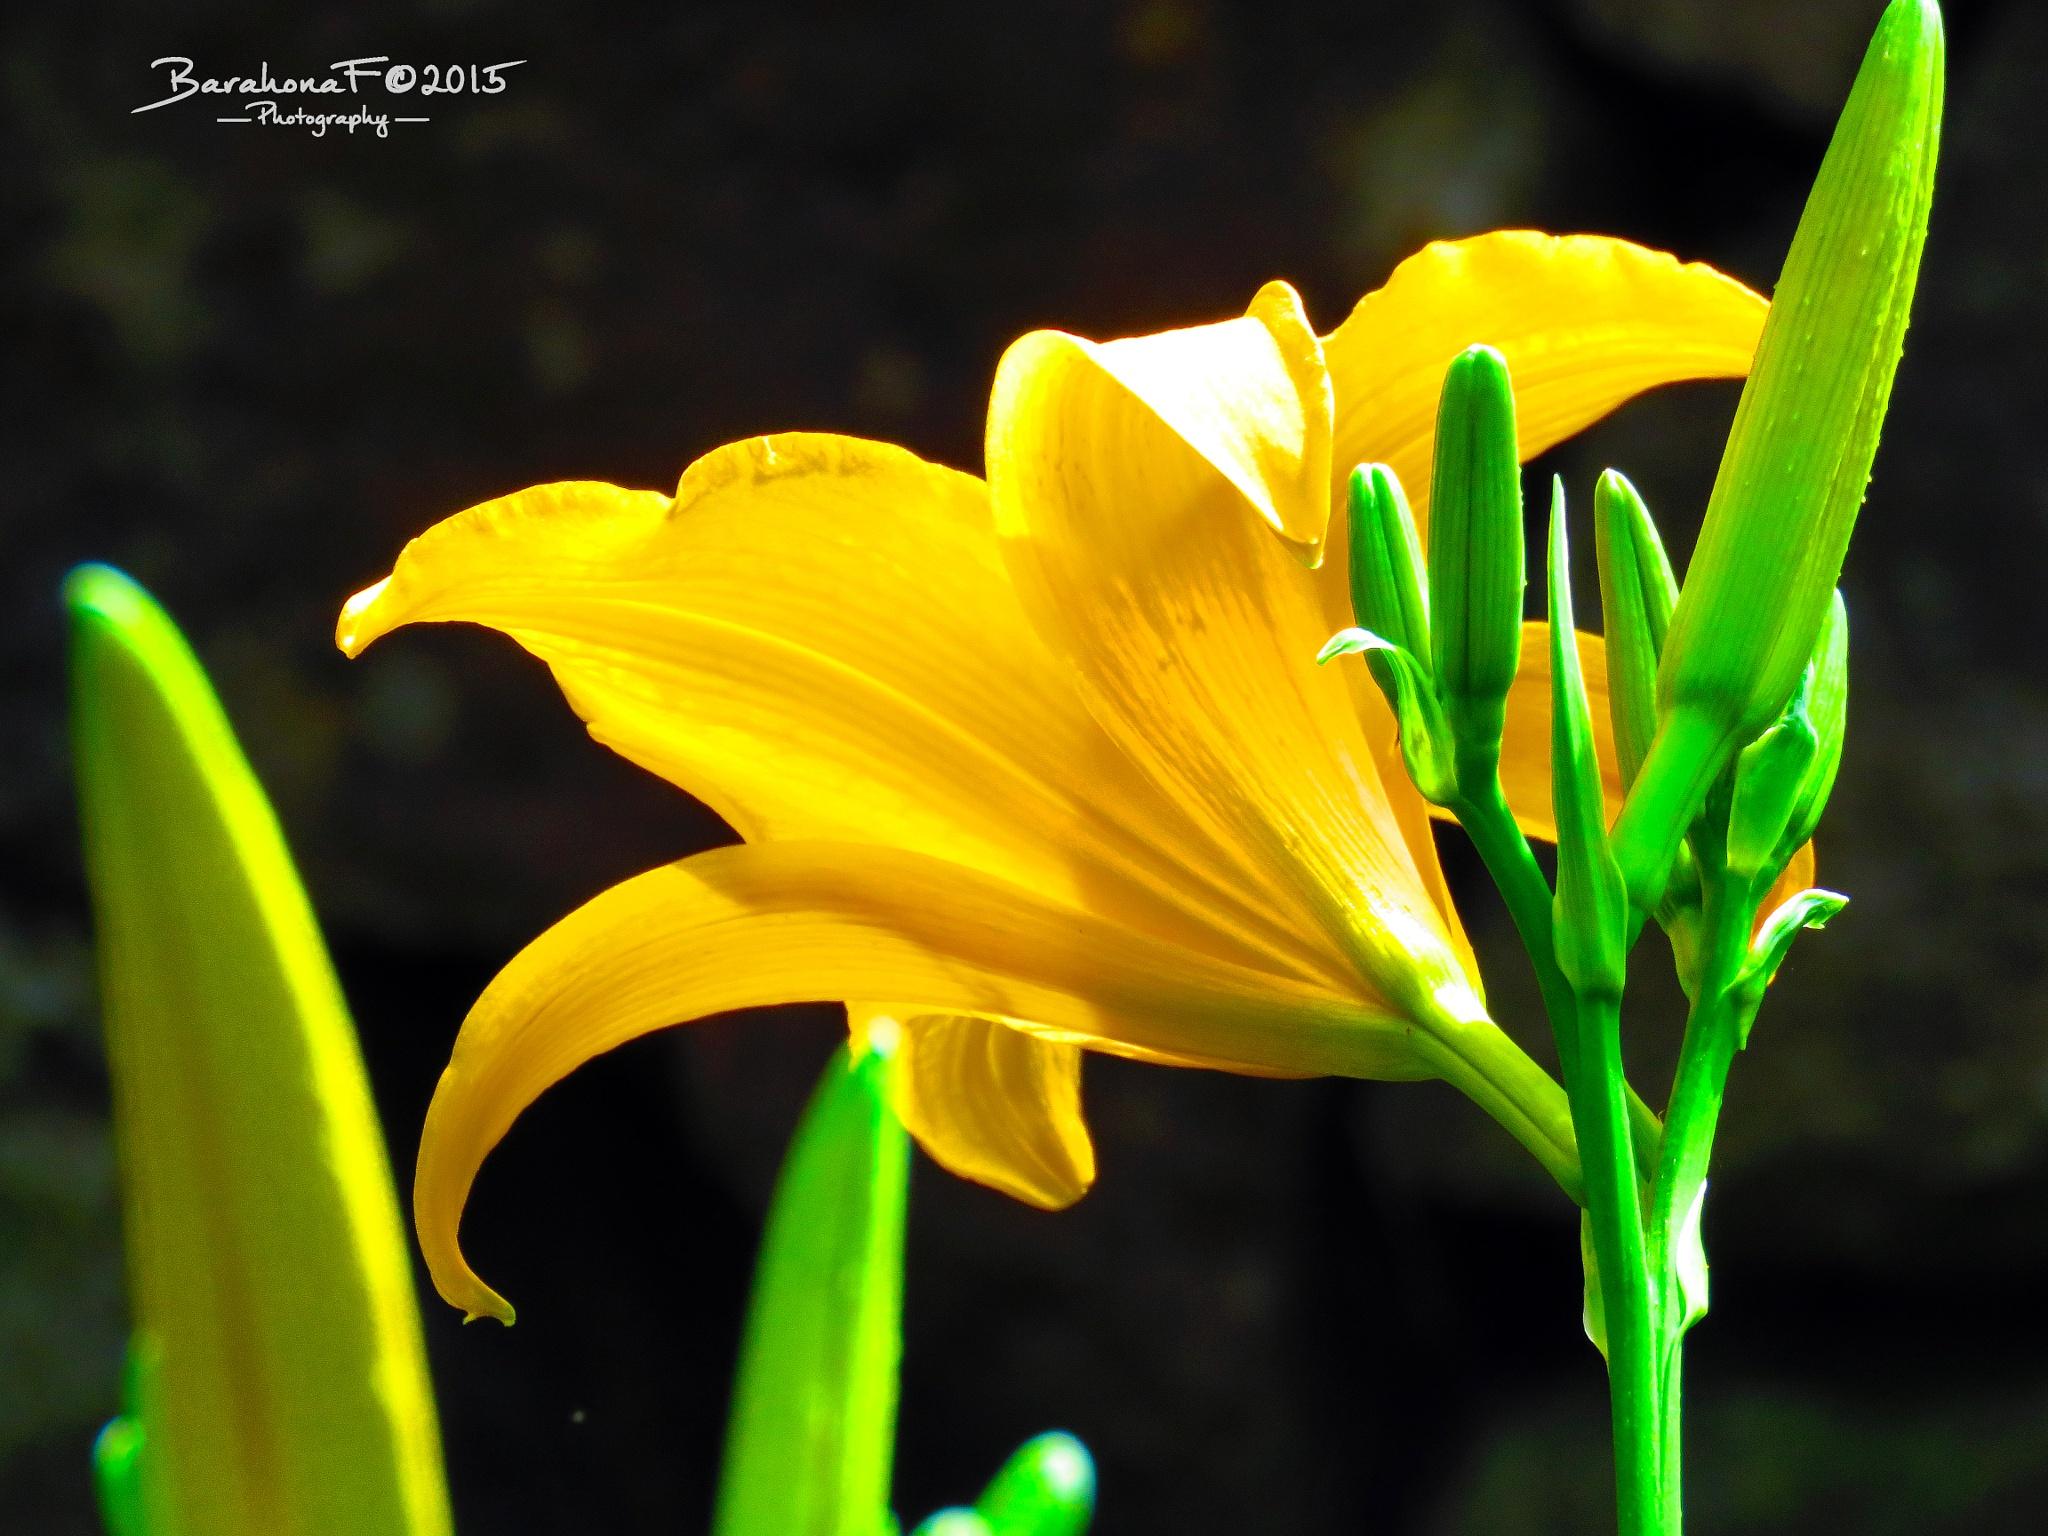 Lilies (2) by Fredy Barahona